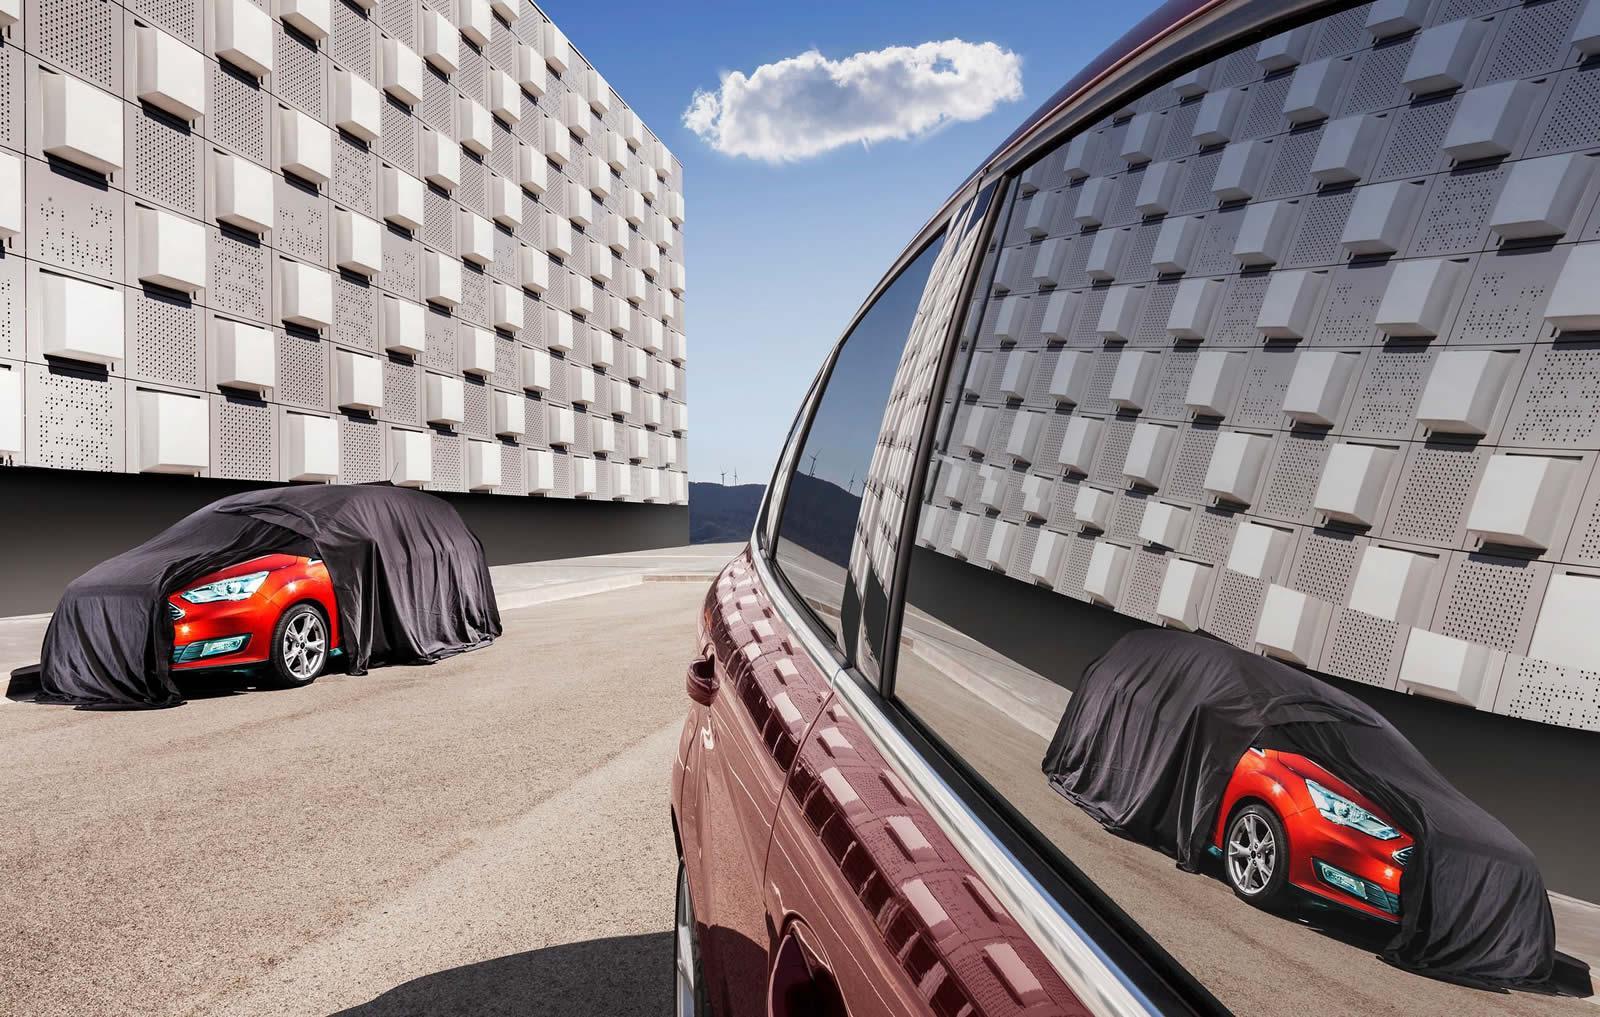 2015-Ford-Mustang-Photos-48[2].jpg